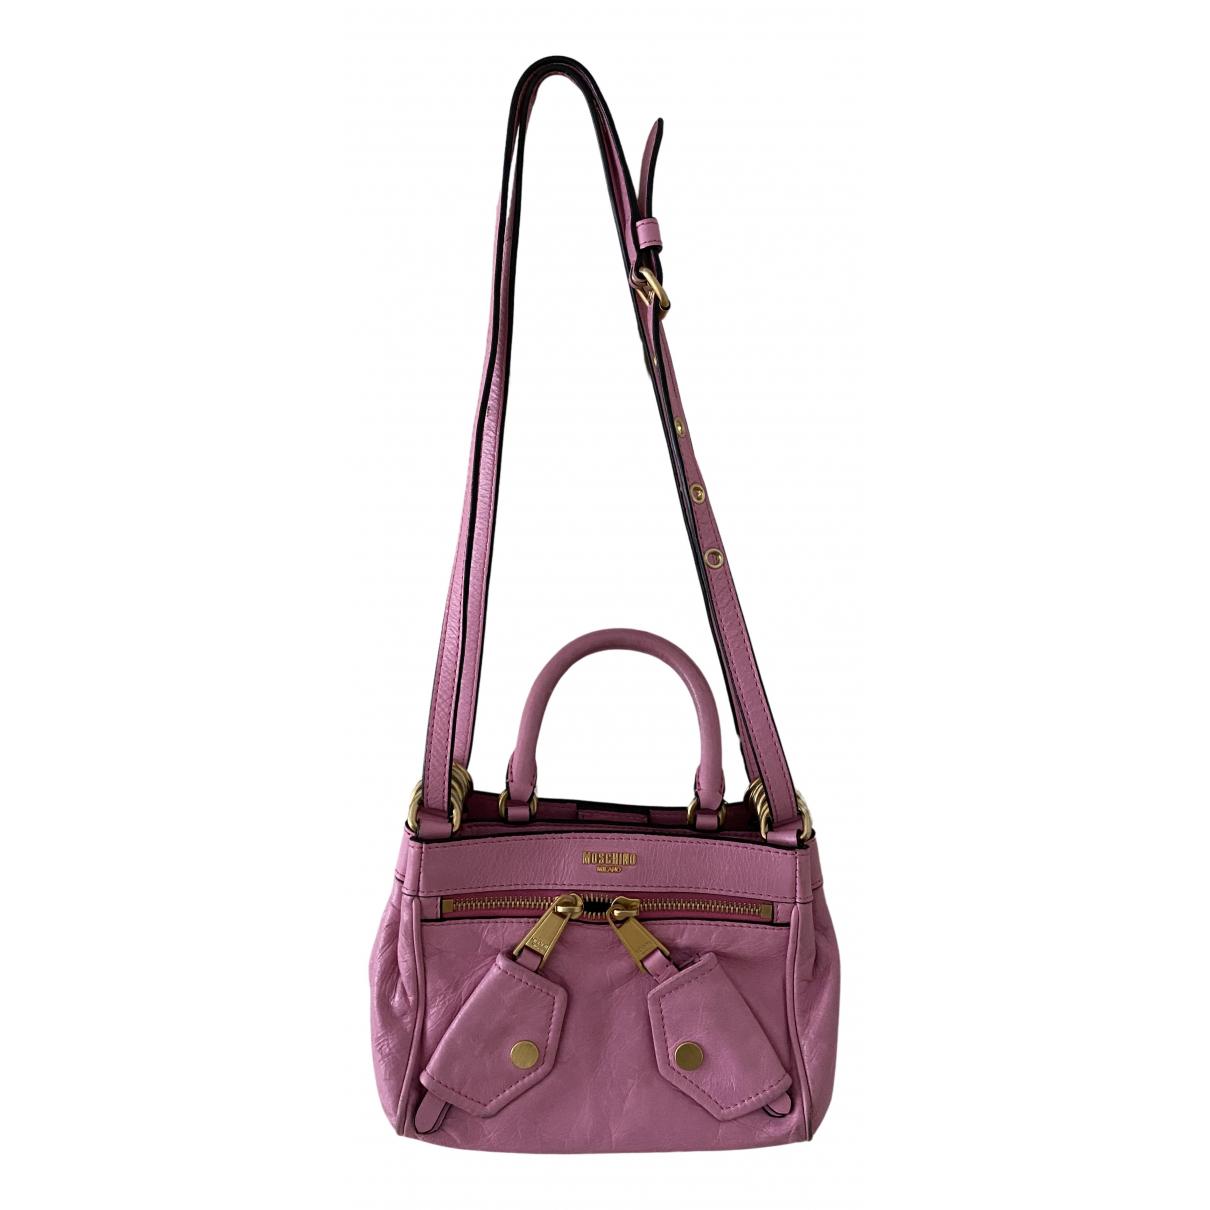 Moschino N Pink Leather handbag for Women N